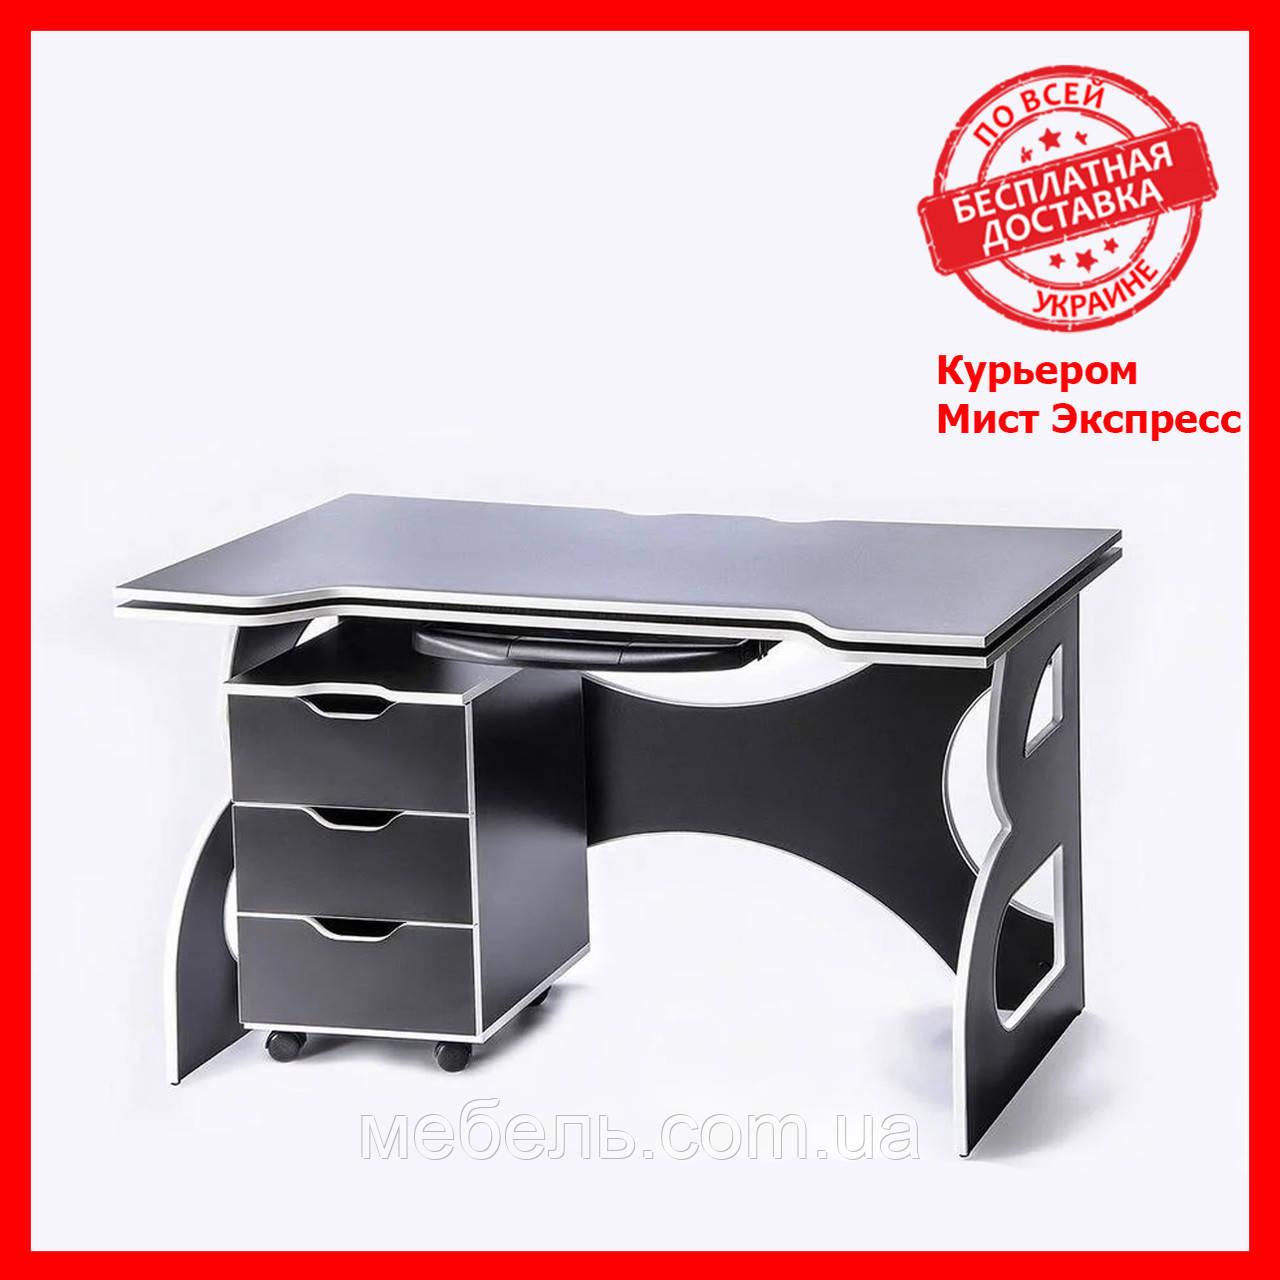 Компьютерный стол с тумбой Barsky Game White HG-06/СUP-06/ПК-01